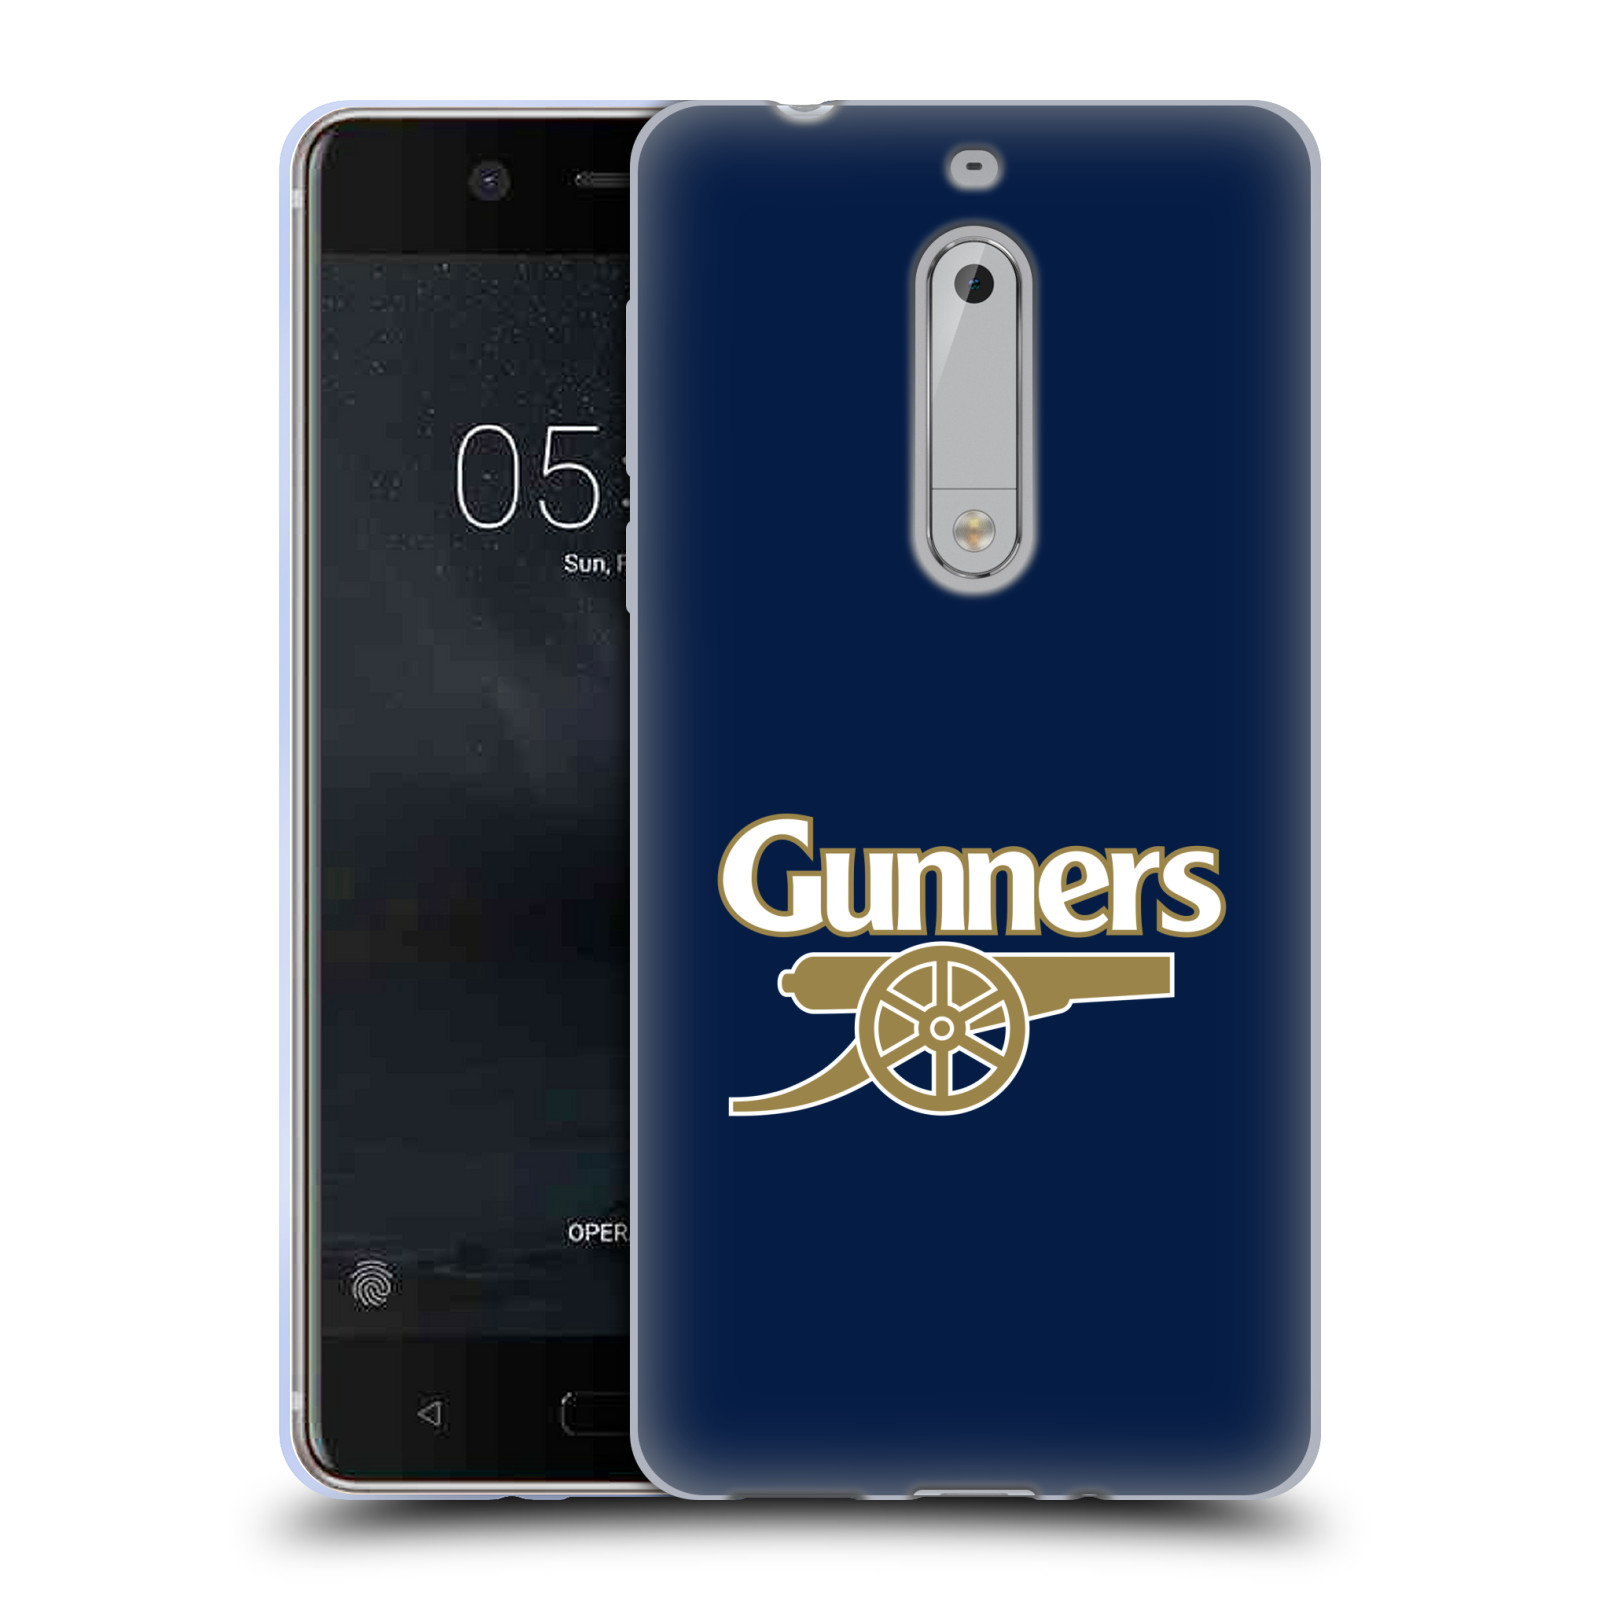 Silikonové pouzdro na mobil Nokia 5 Head Case - Arsenal FC - Gunners